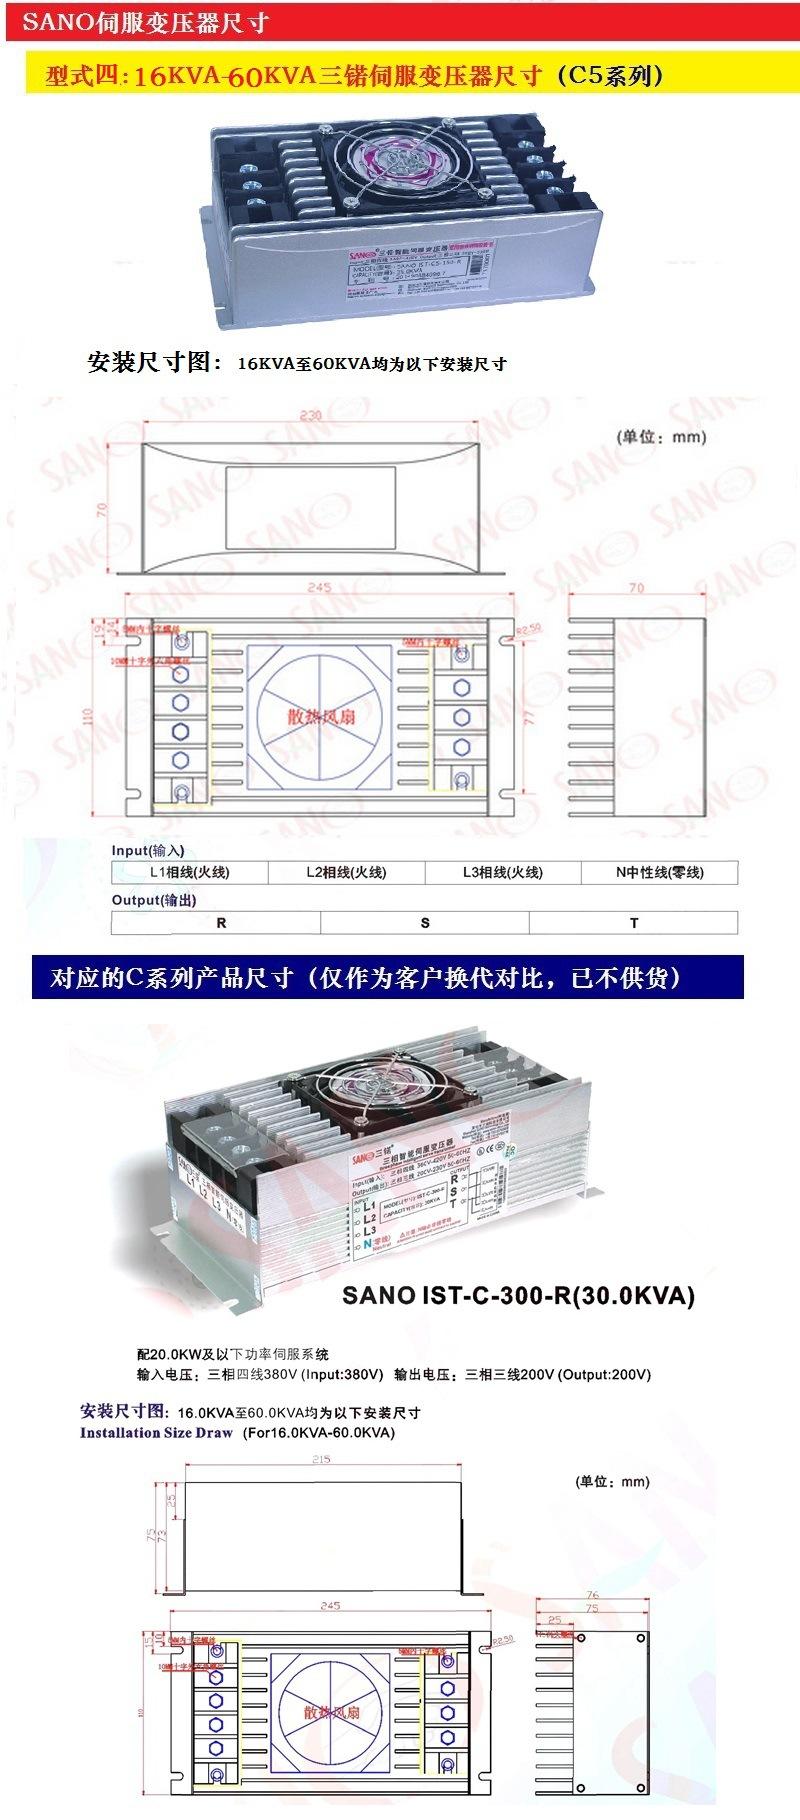 IST-C5-005伺服变压器0.5KVA三锘SANO伺服电子变压器380V转200V示例图6